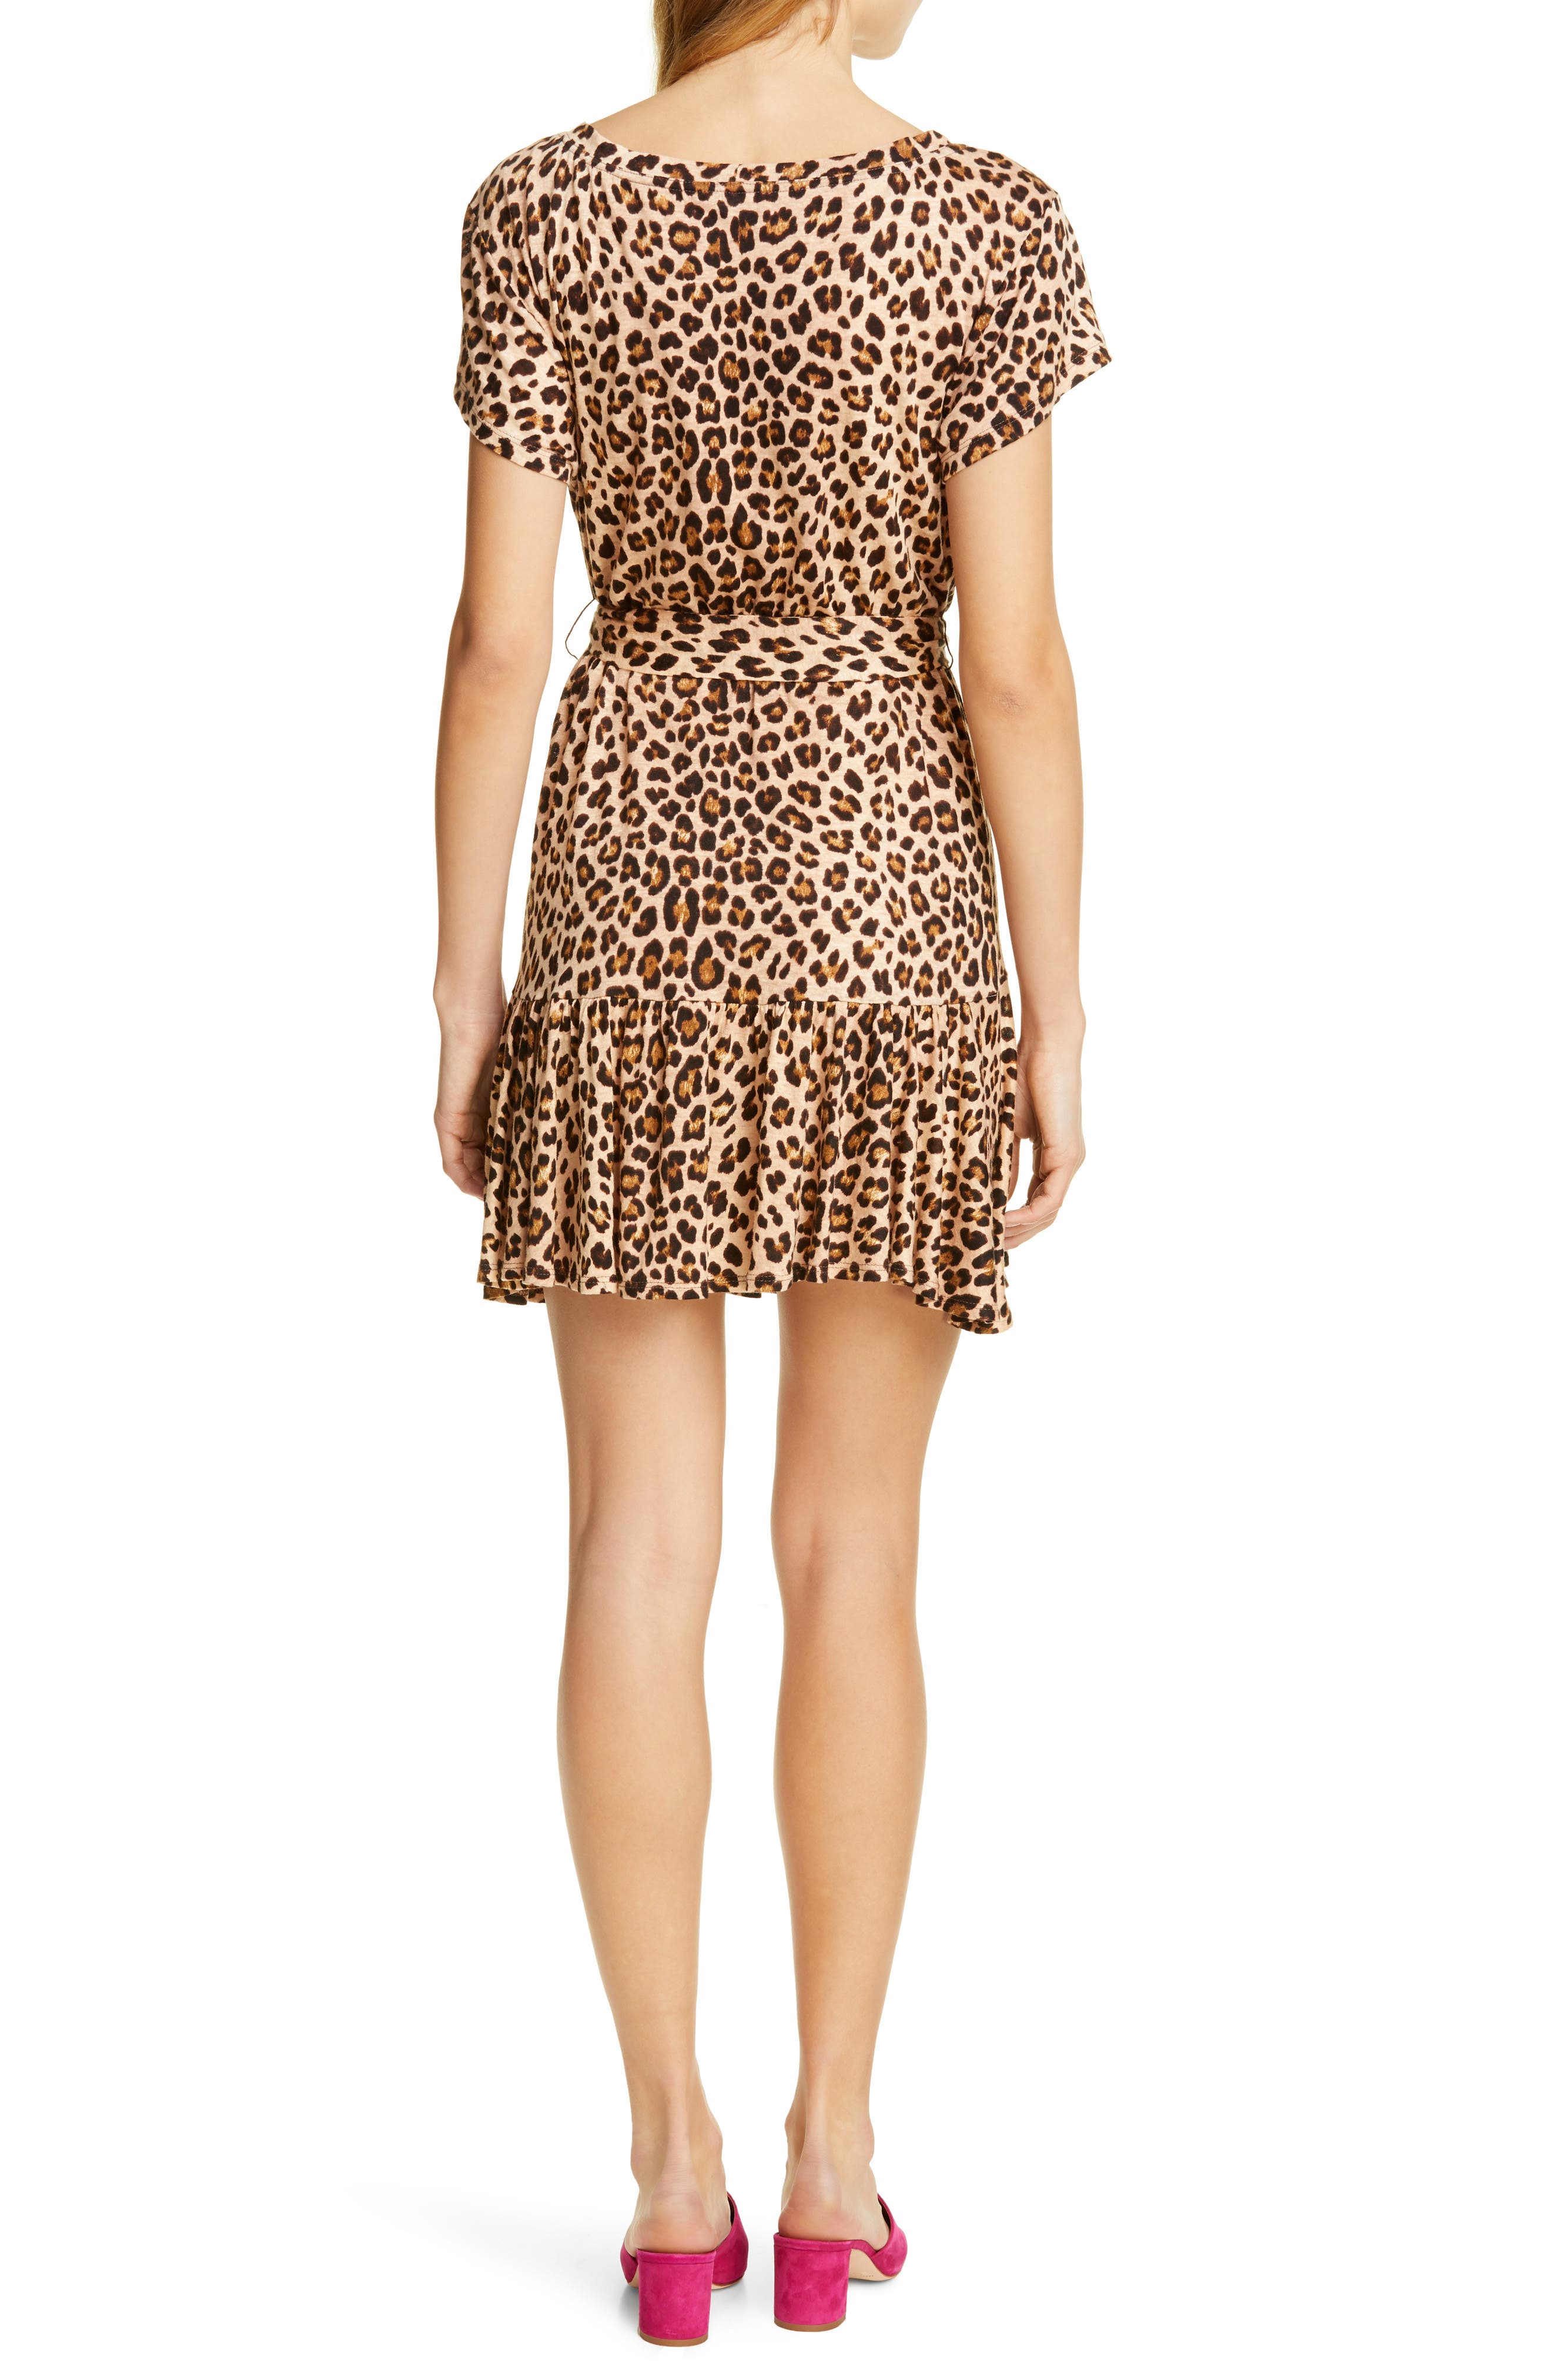 REBECCA TAYLOR, Leopard Print Linen Minidress, Alternate thumbnail 2, color, BISCUIT